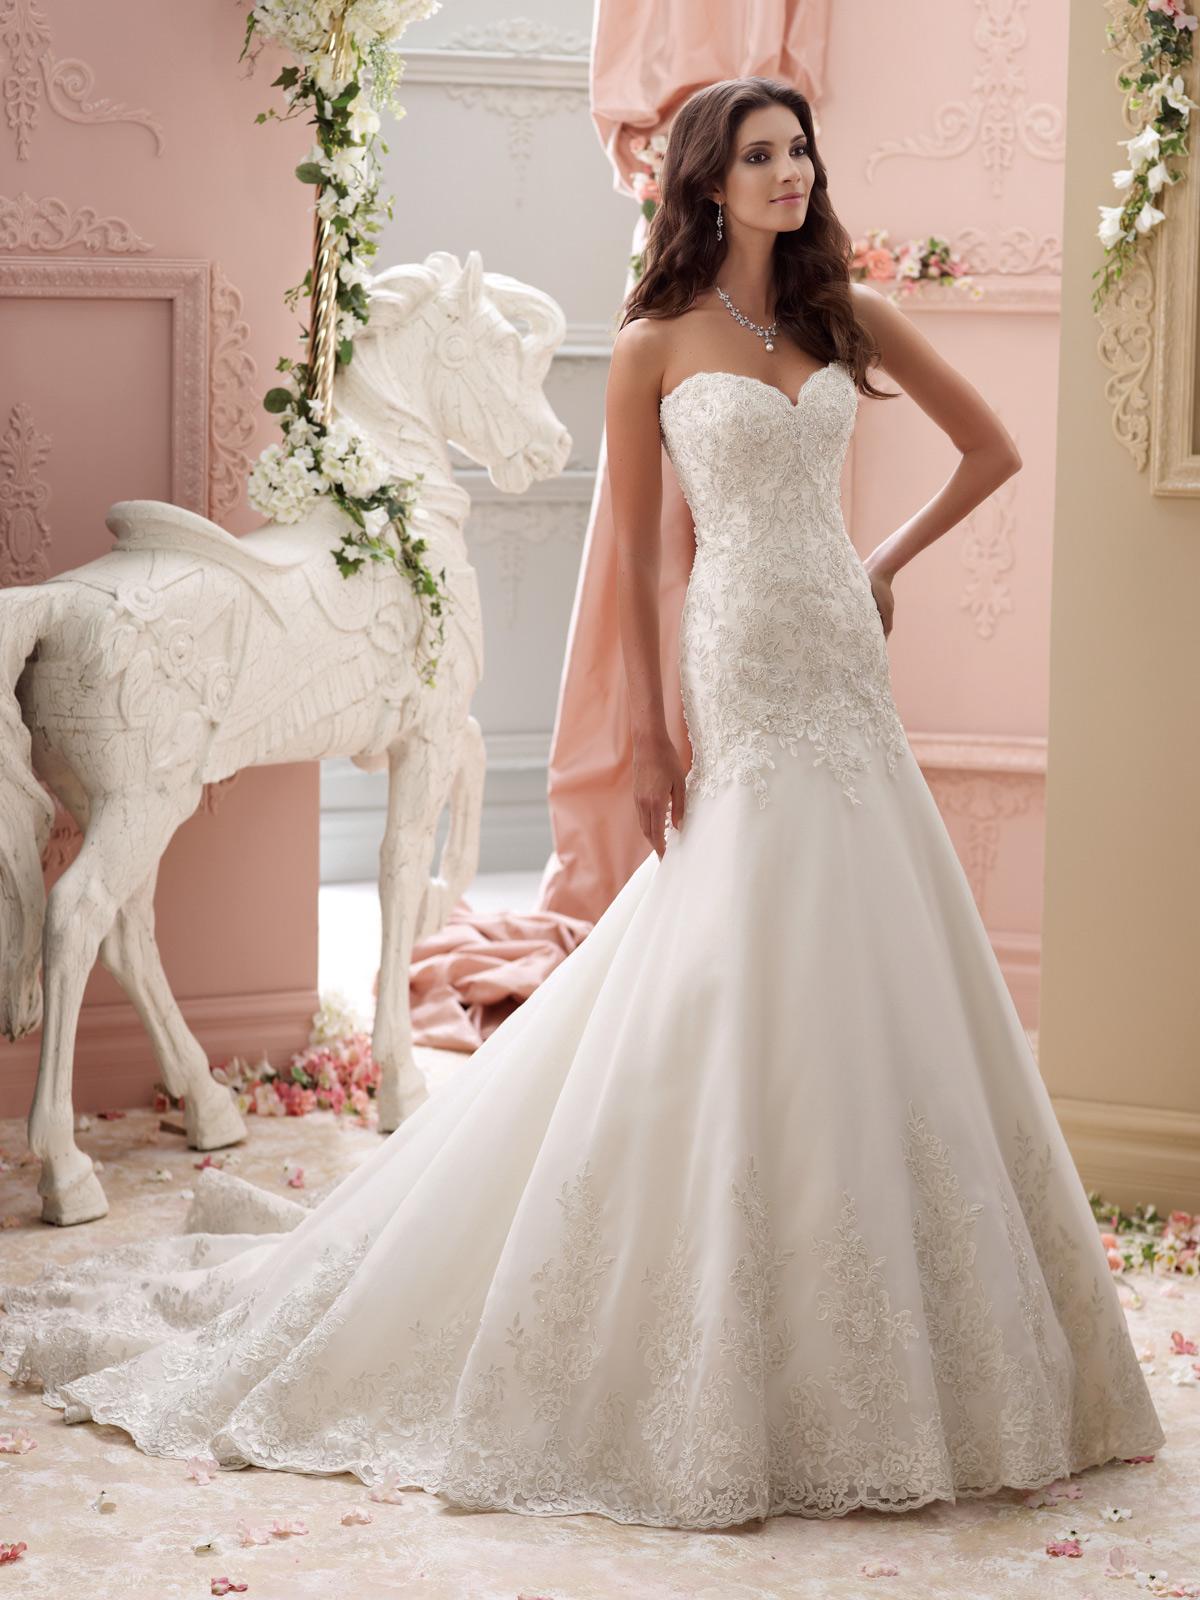 David Tutera 2015 Spring Bridal Collection Fashionbride